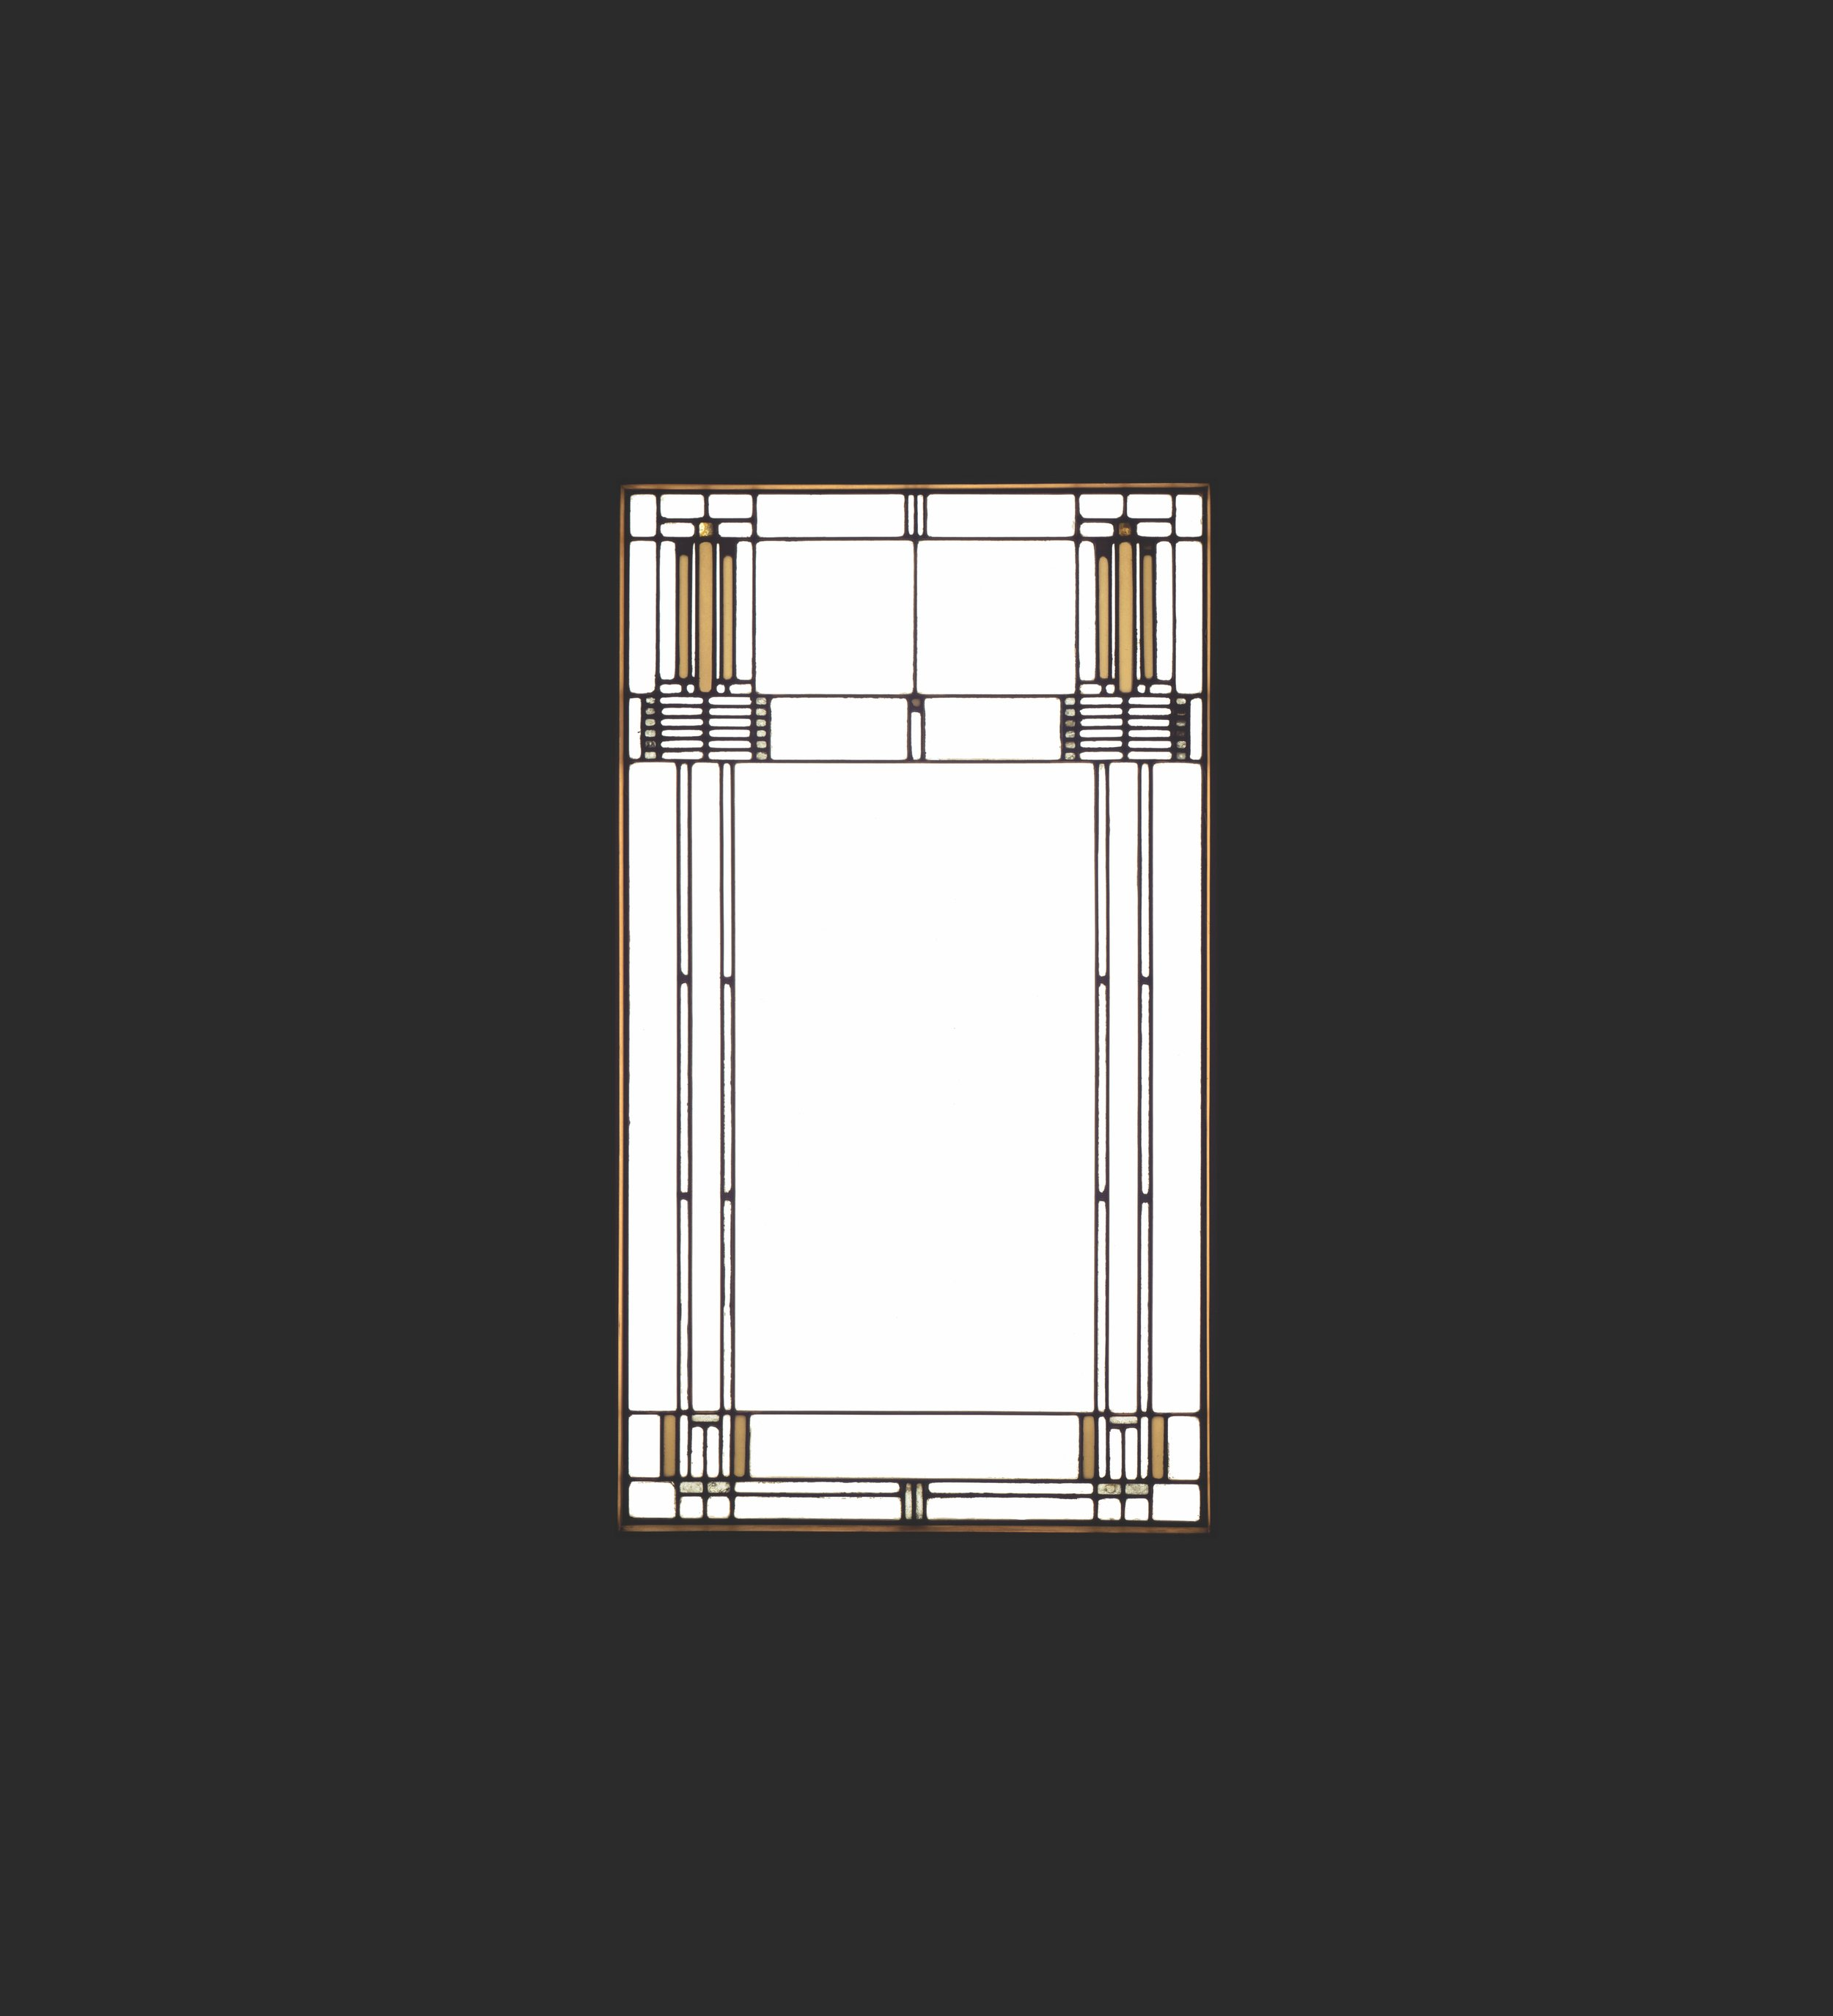 Wright_Art_Glass_Window_i040954.jpg